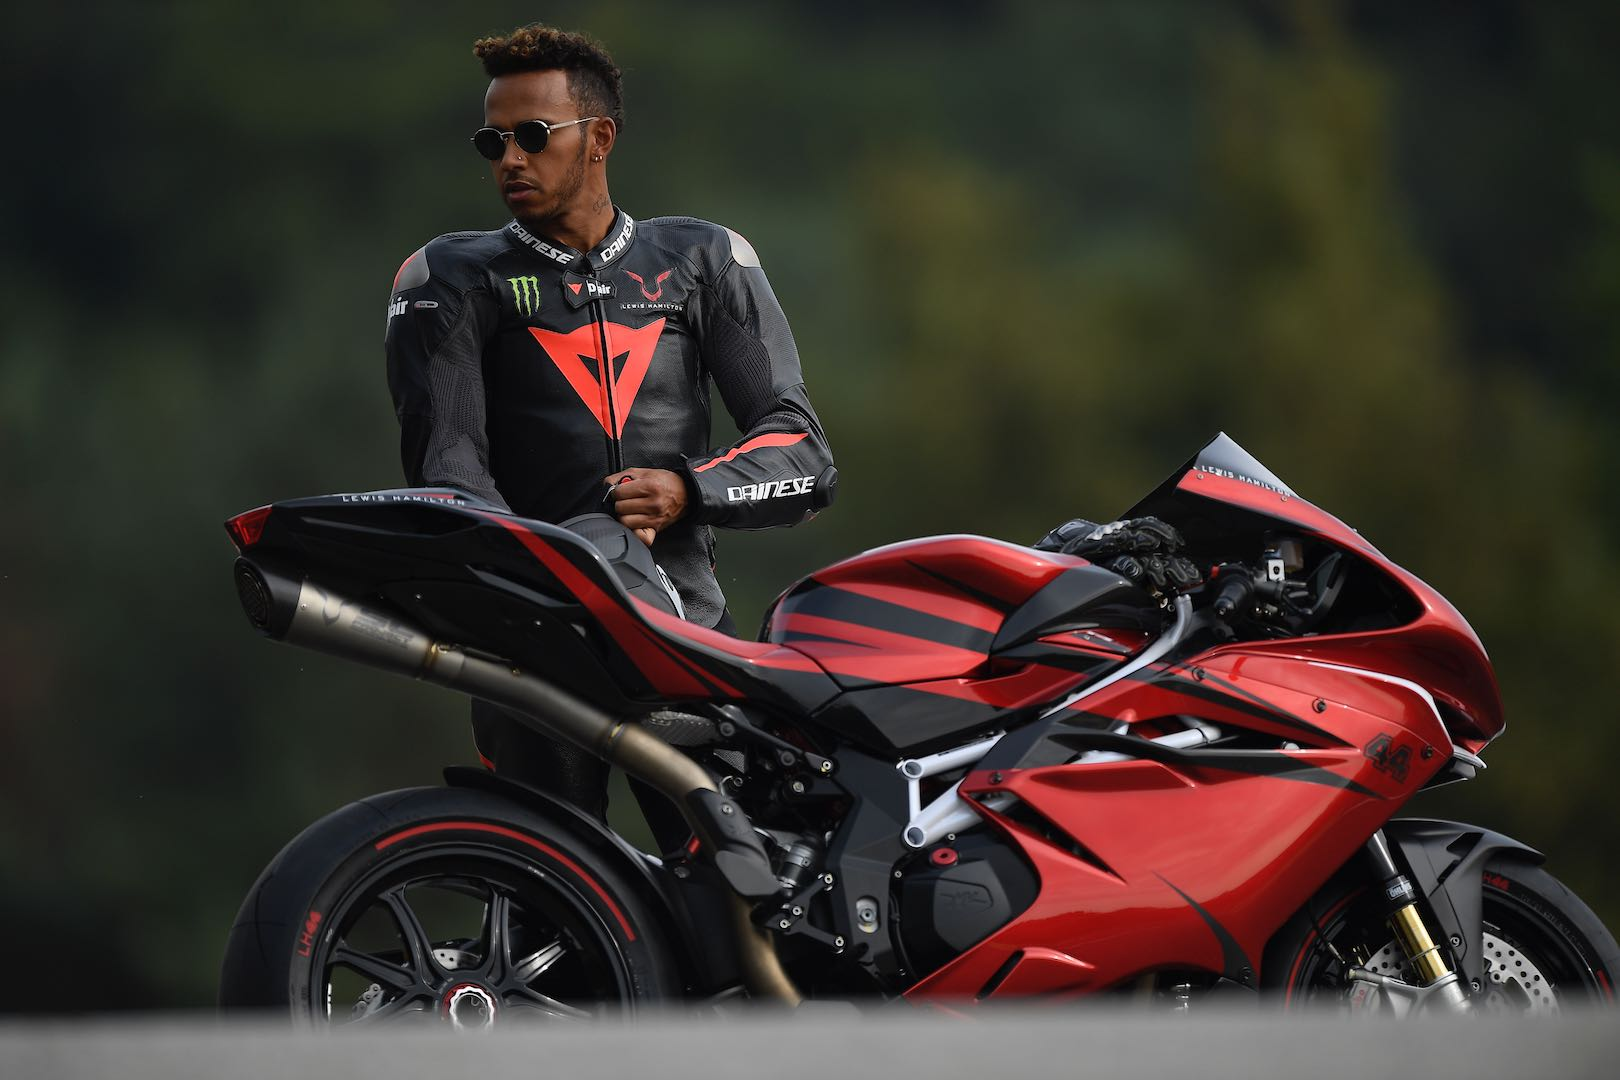 F1 star Lewis Hamilton unveils new F4 LH44 bike with MV Agusta